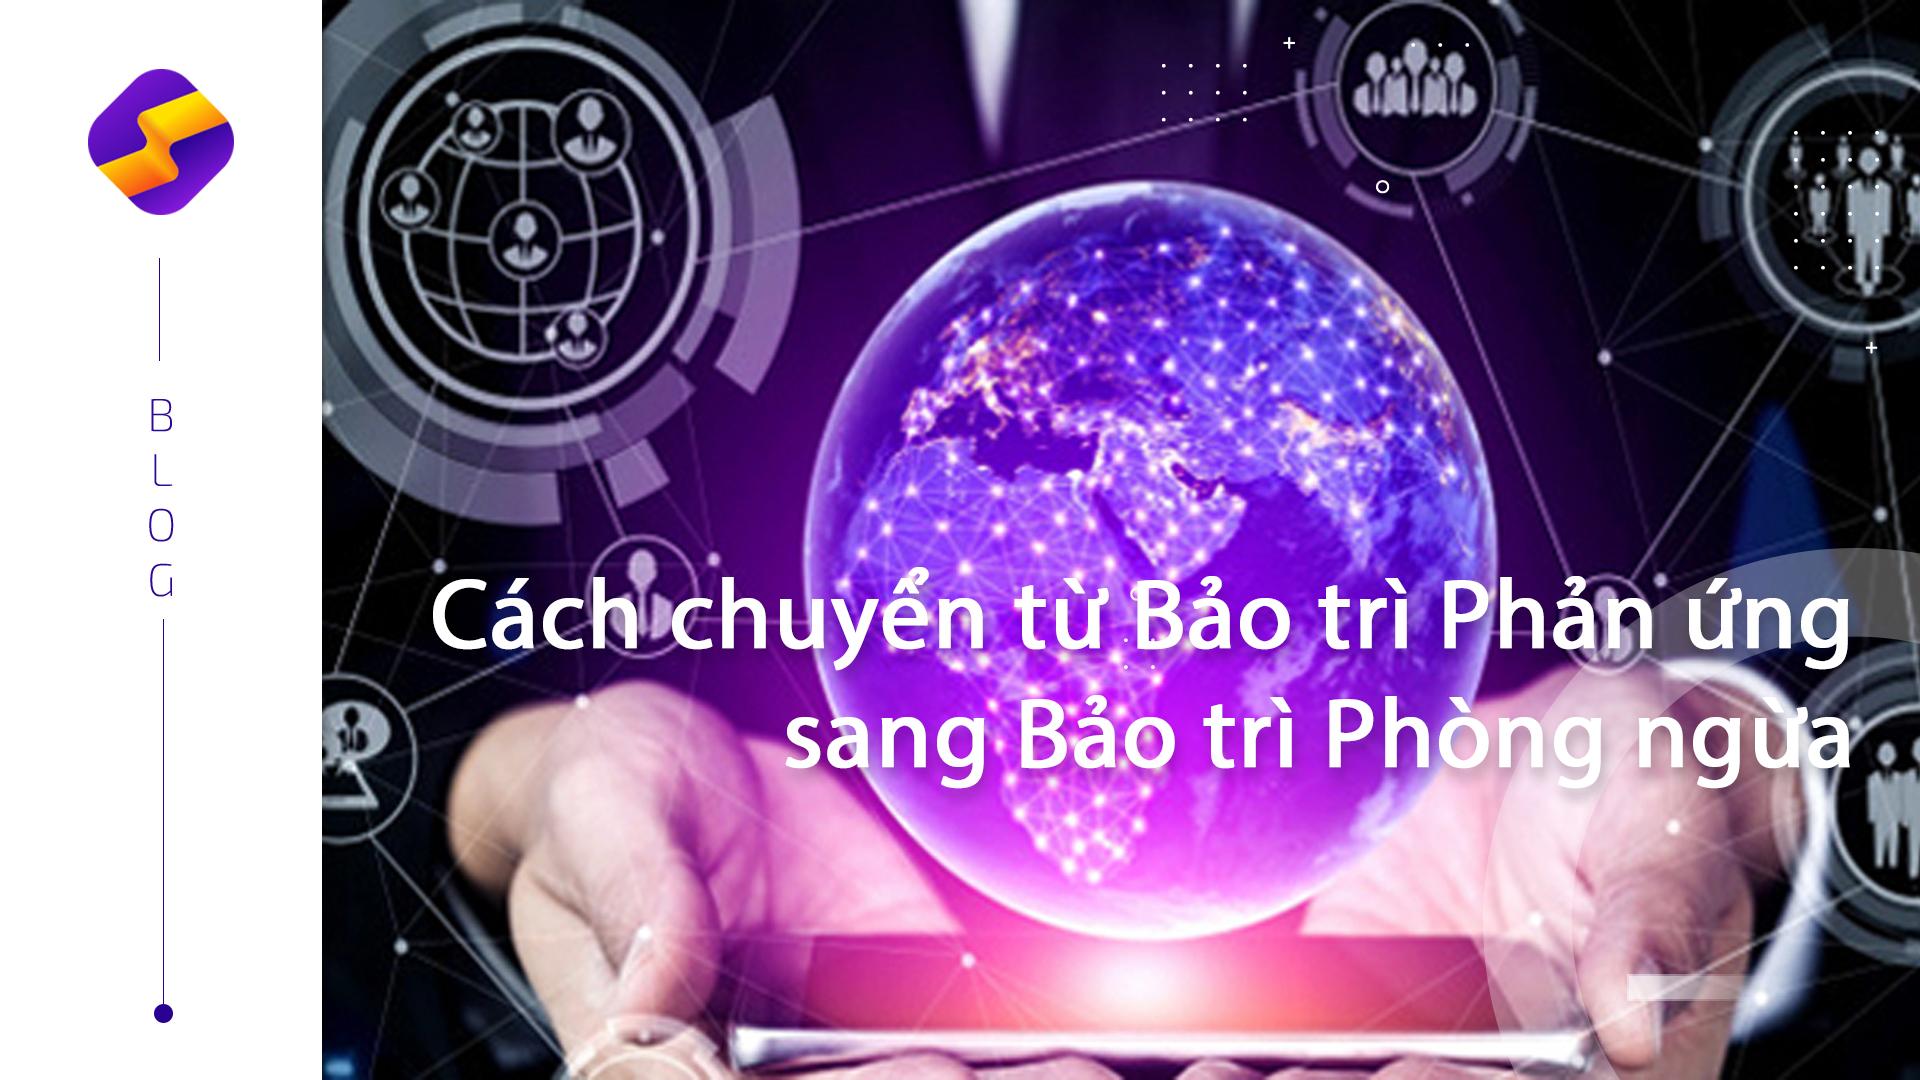 speedmaint-bao-tri-phan-ung-4